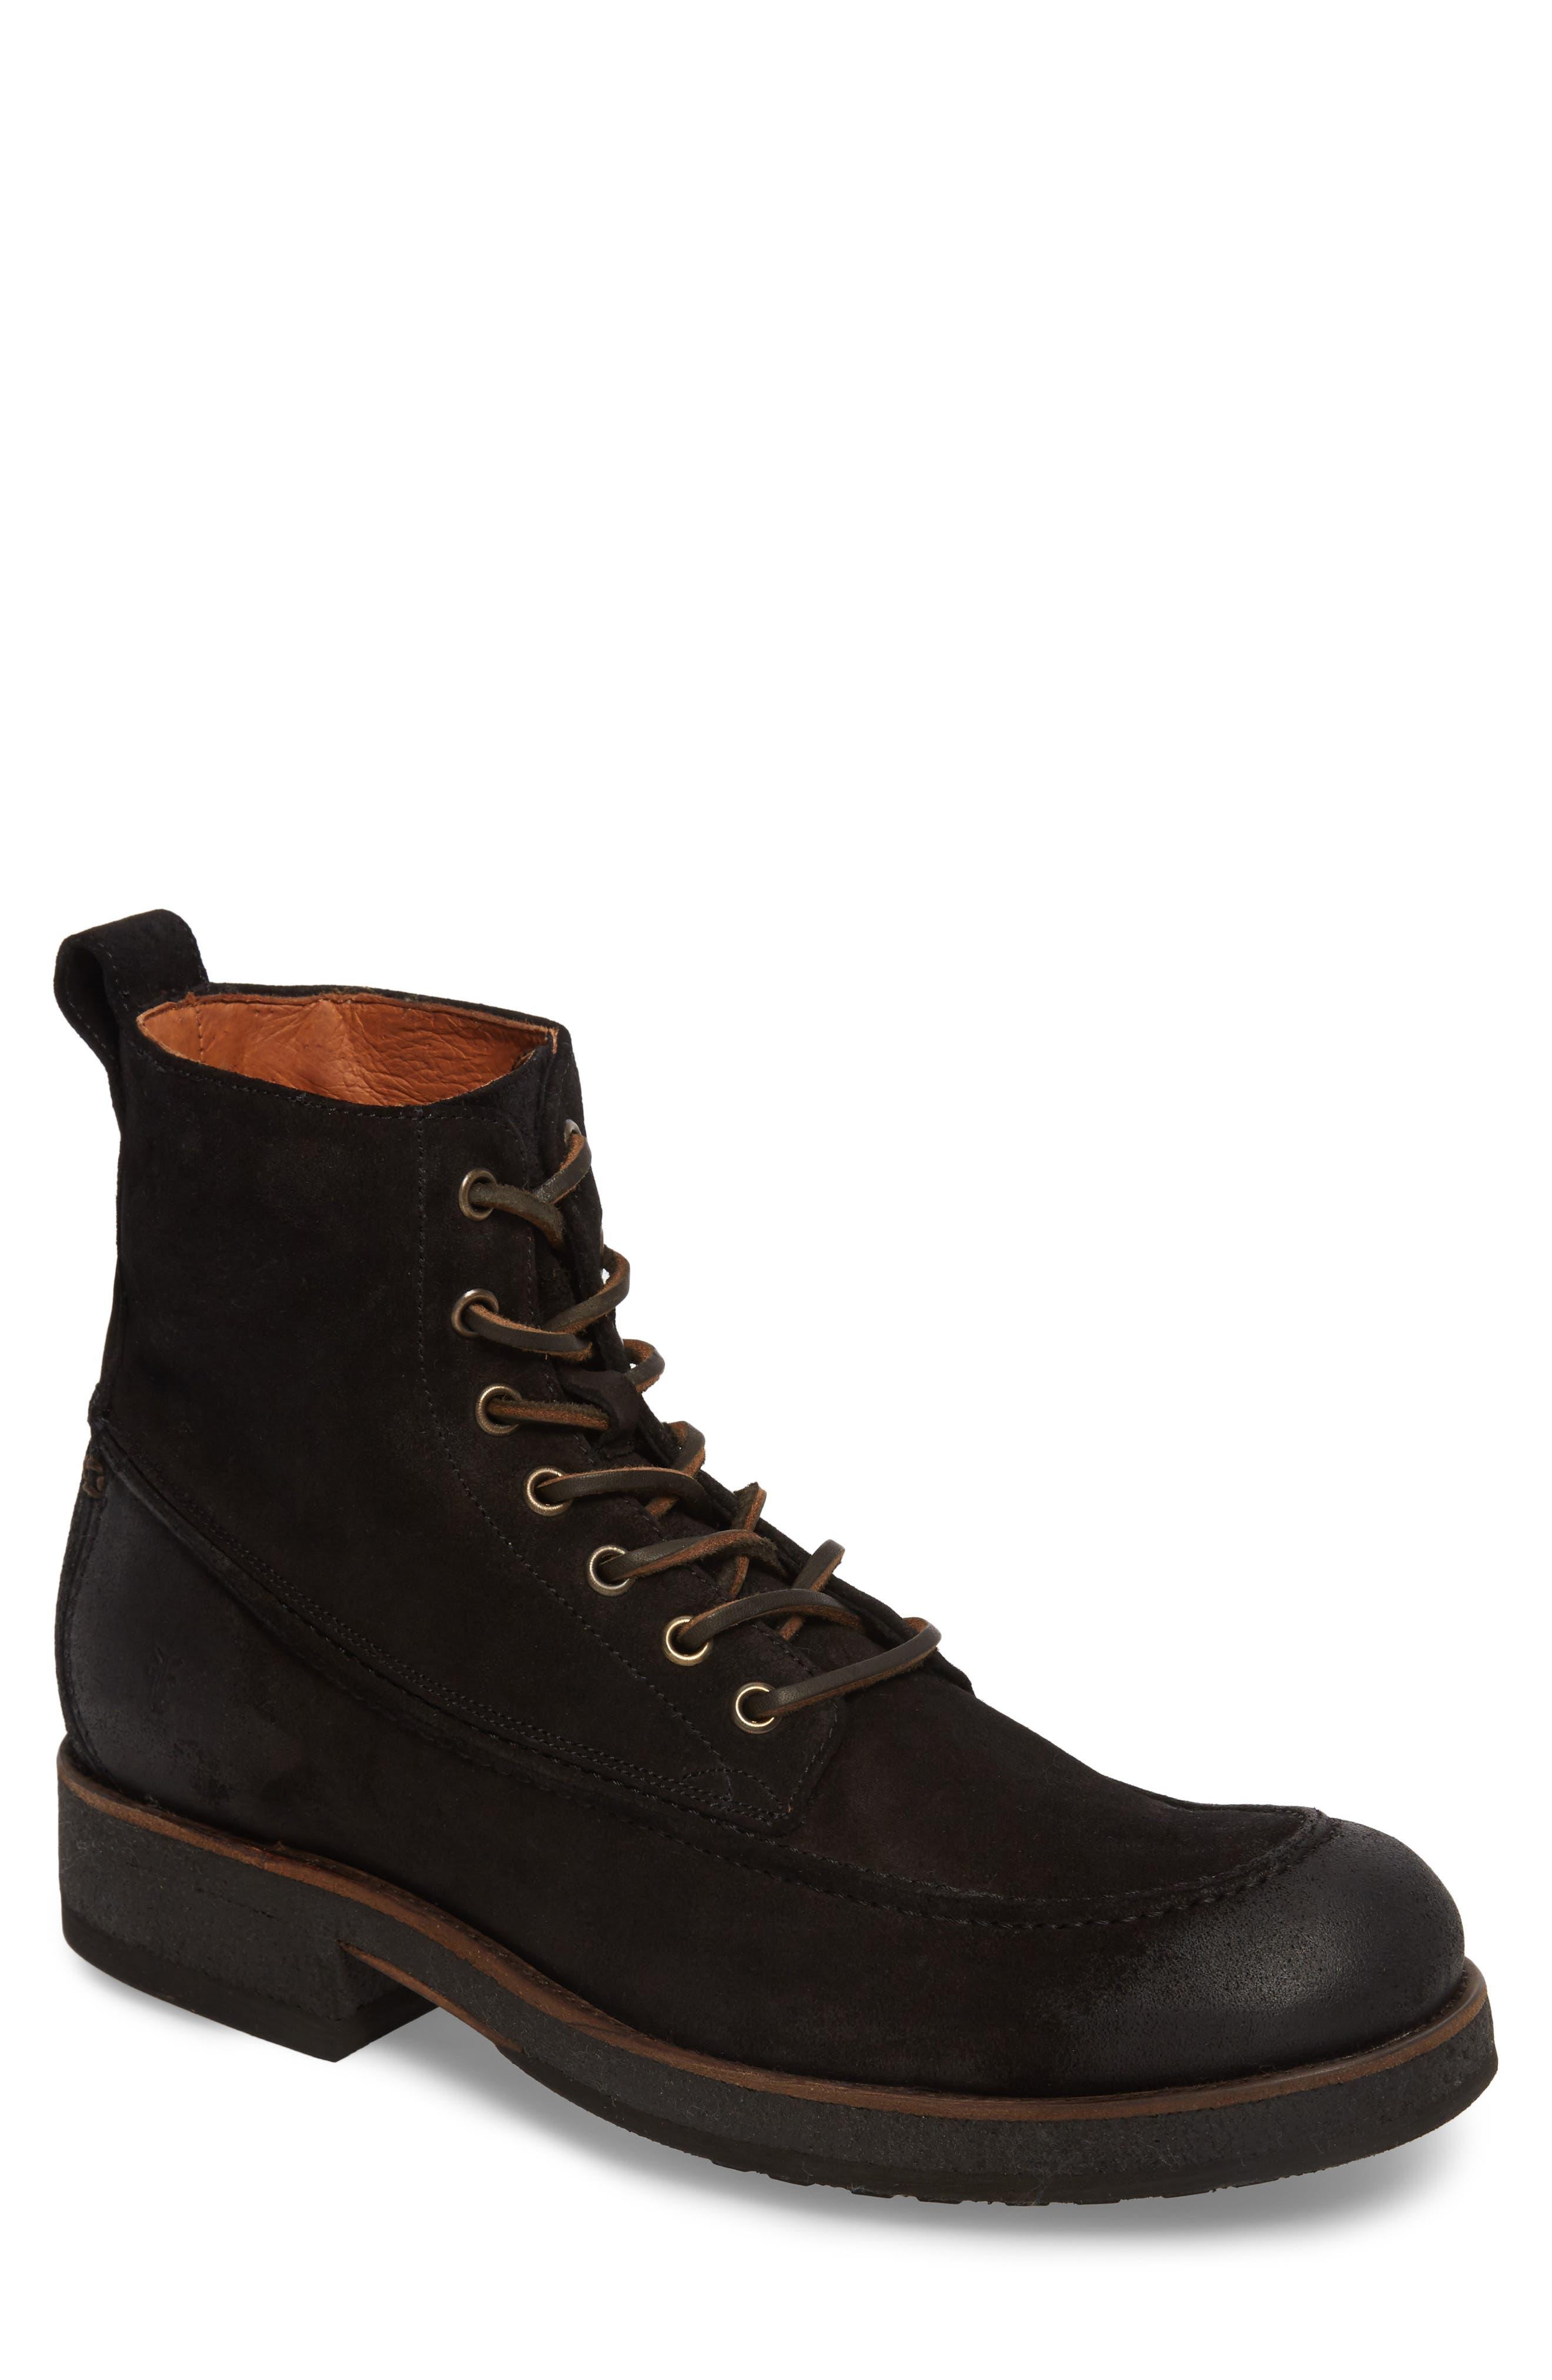 Main Image - Frye Rainier Waxed Work Boot (Men)